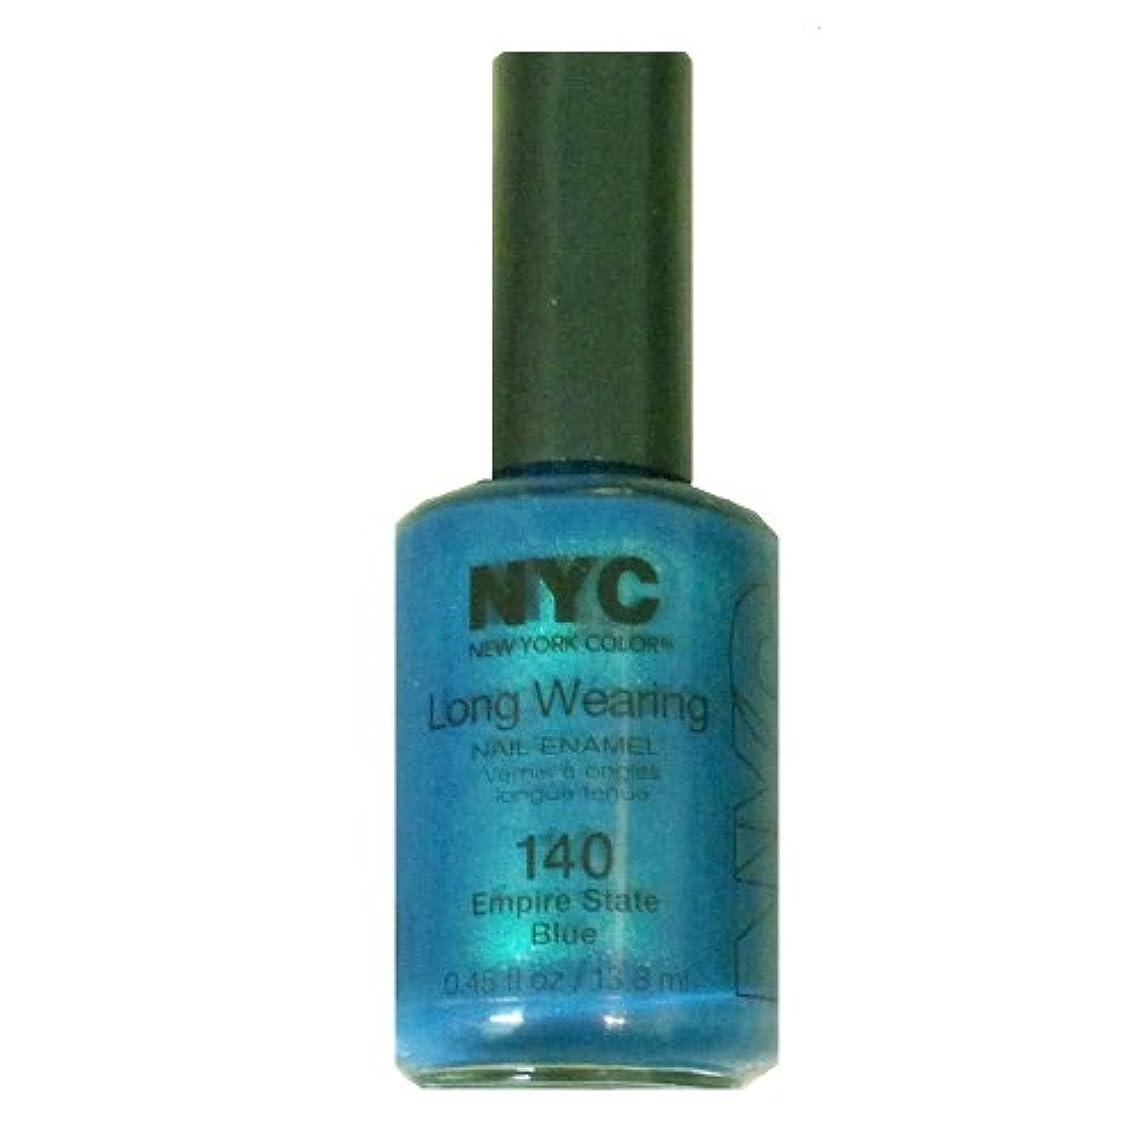 社会小石絶望NYC Long Wearing Nail Enamel - Empire State Blue (並行輸入品)